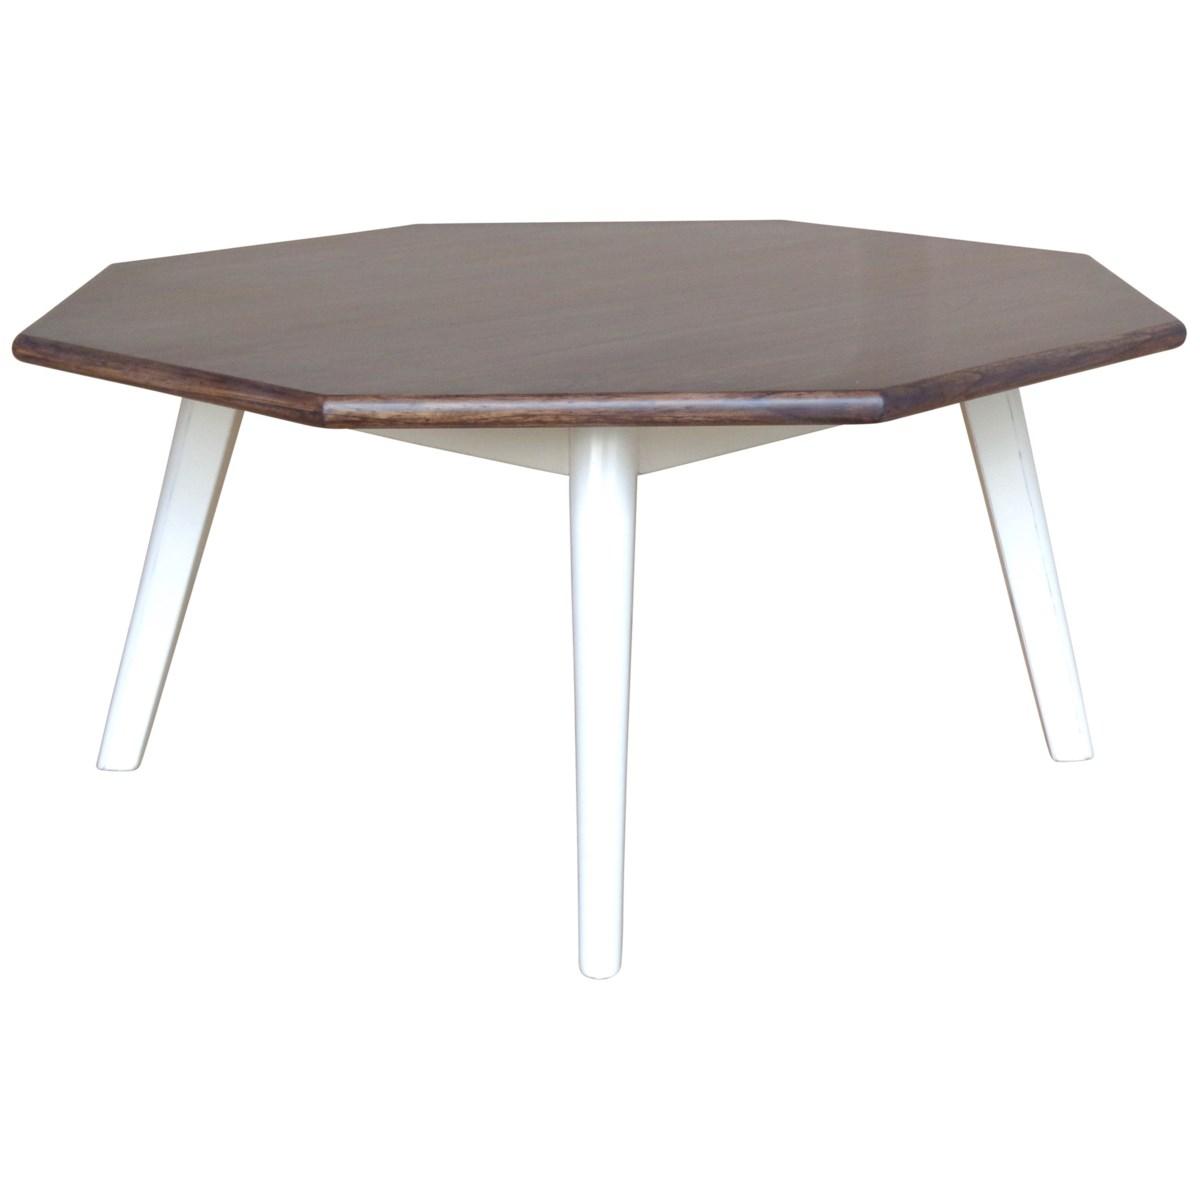 NANTUCKET OCTAIL TABLE - WHT/CC